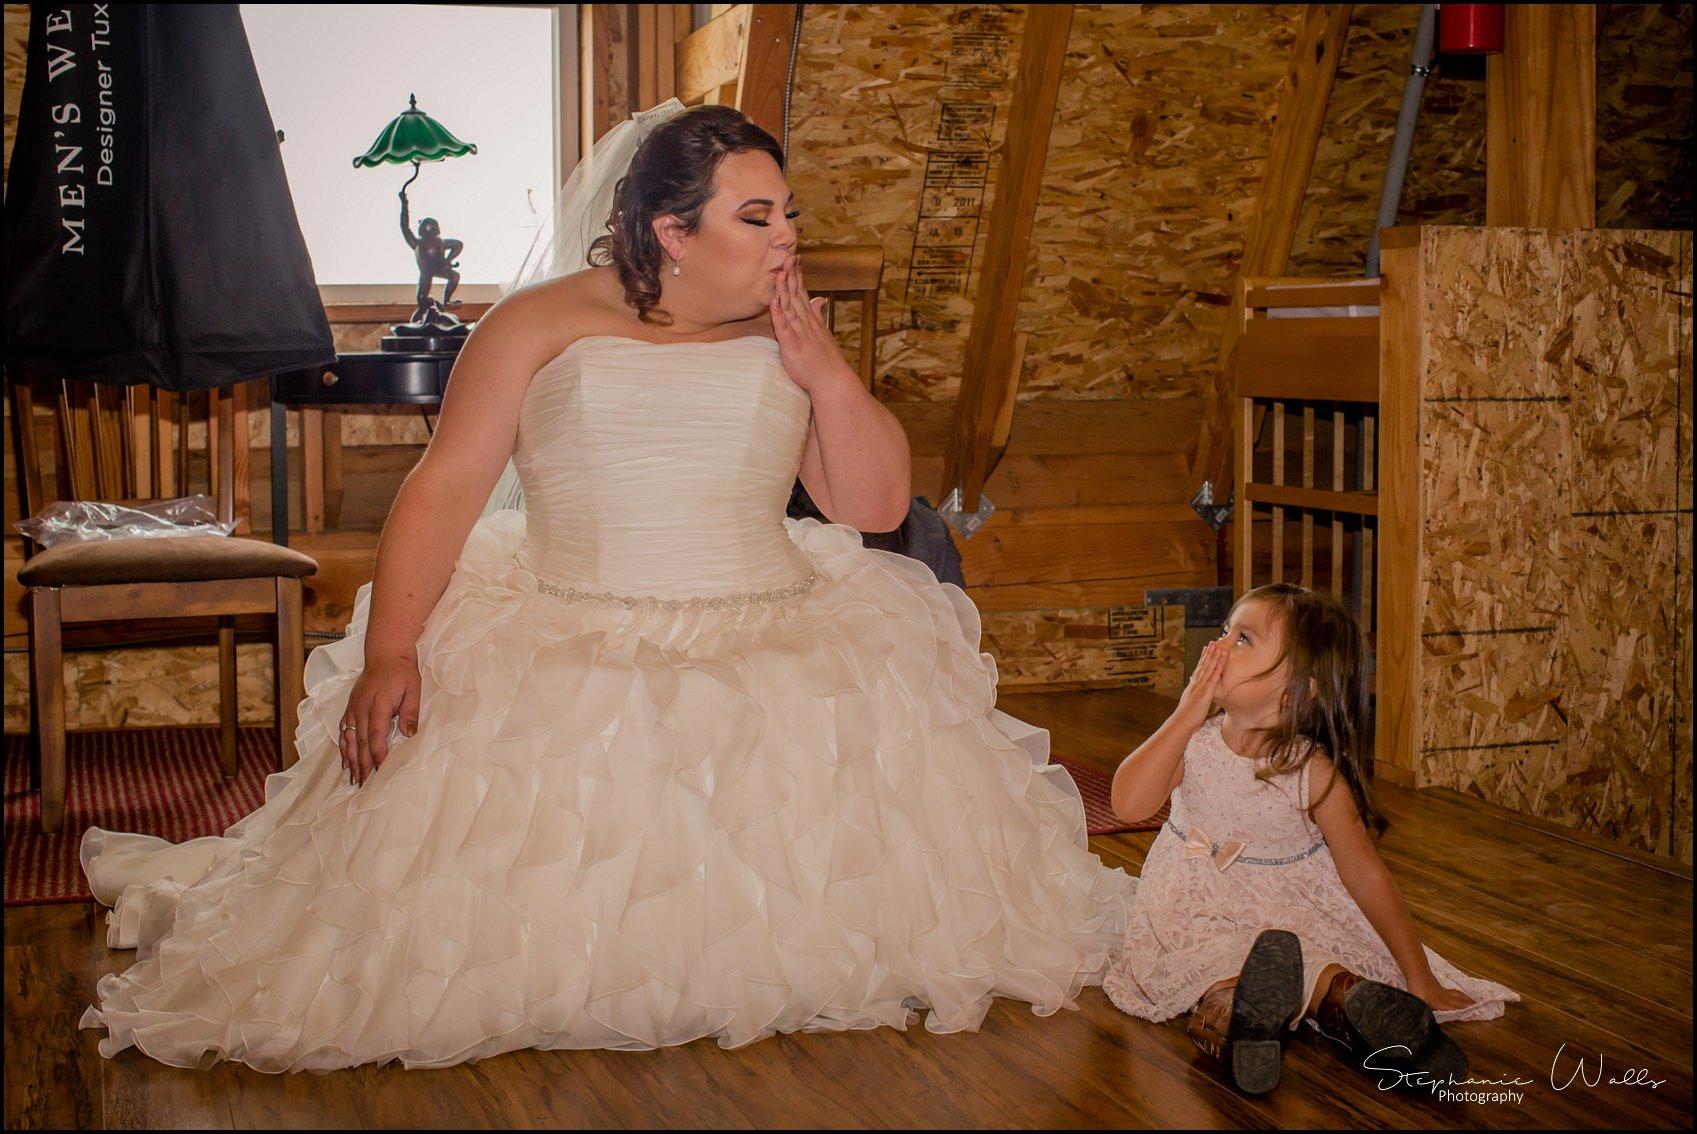 Kimble Wedding 039 Marlena & Allans | Snohomish Red Barn Events (Stocker Farms) | Snohomish, Wa Wedding Photographer